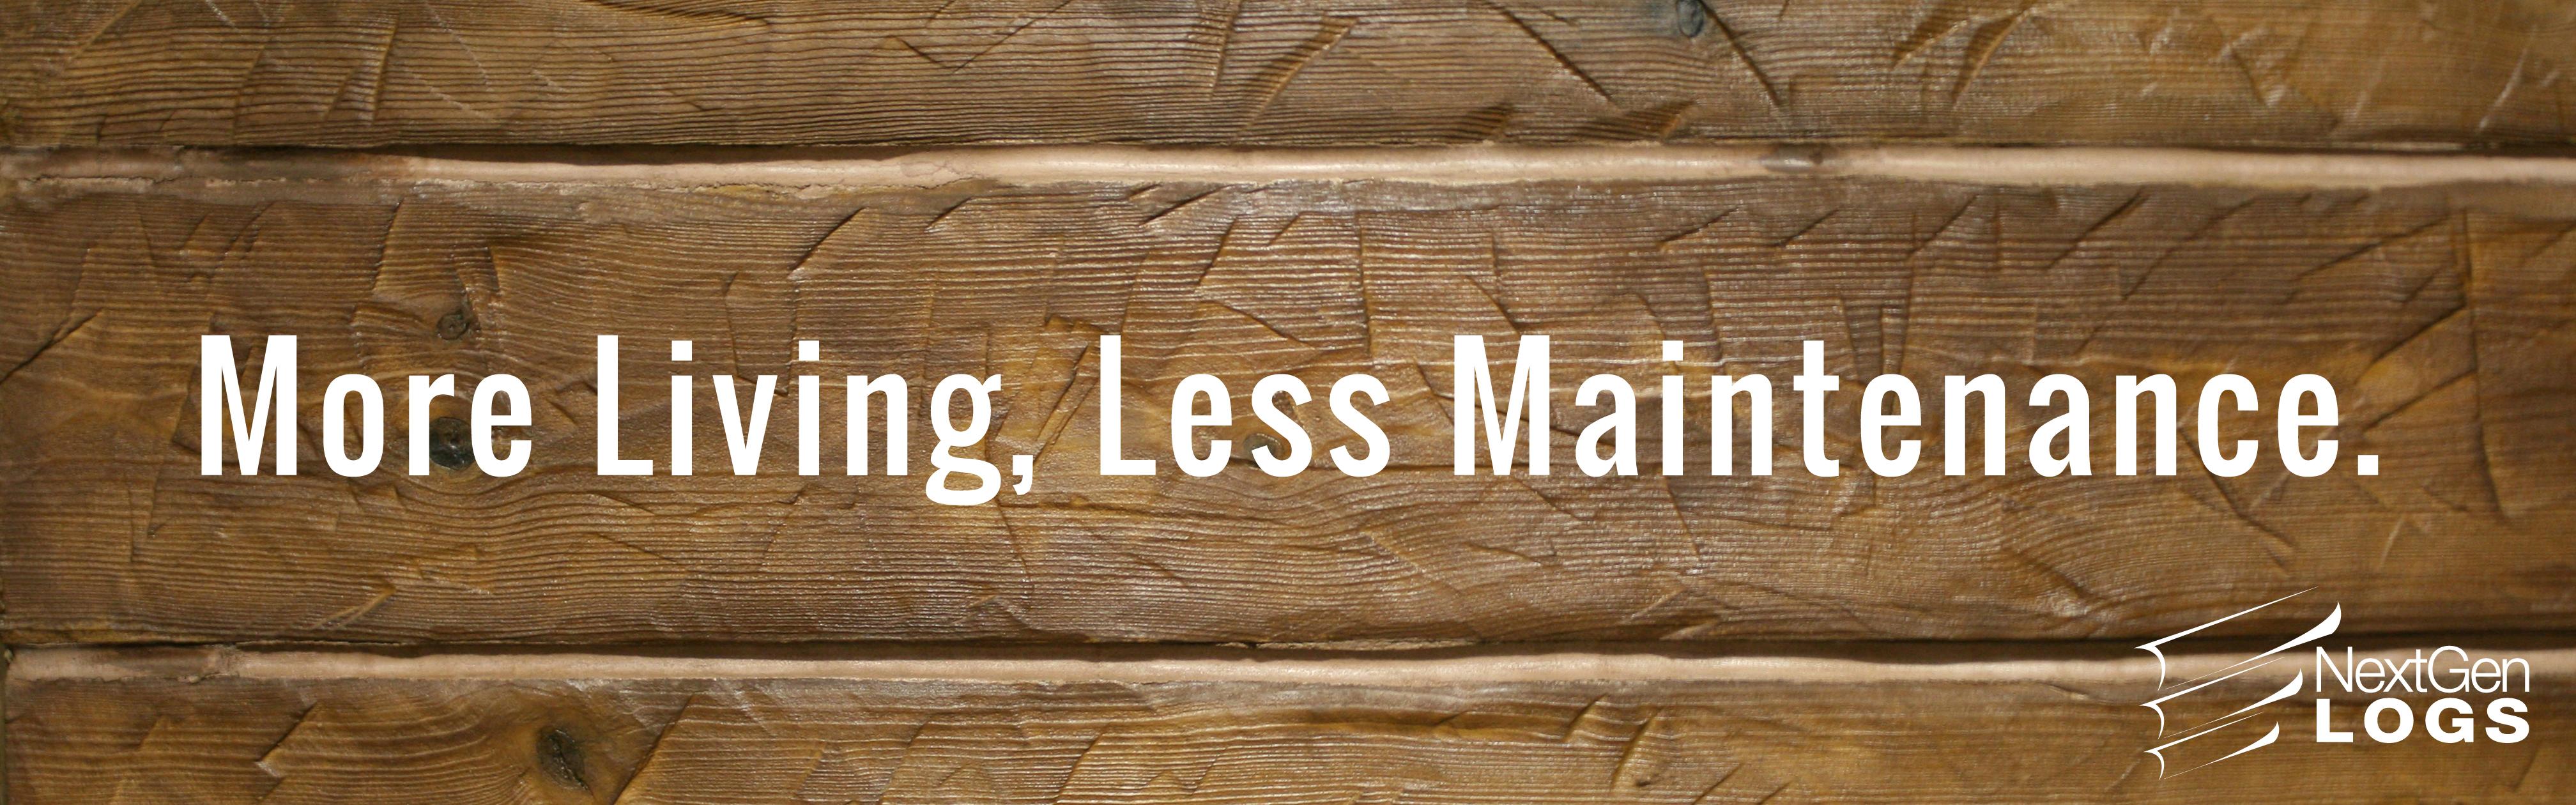 NextGen_Logs_Concrete_Log_Siding_more_living_less_maintenance